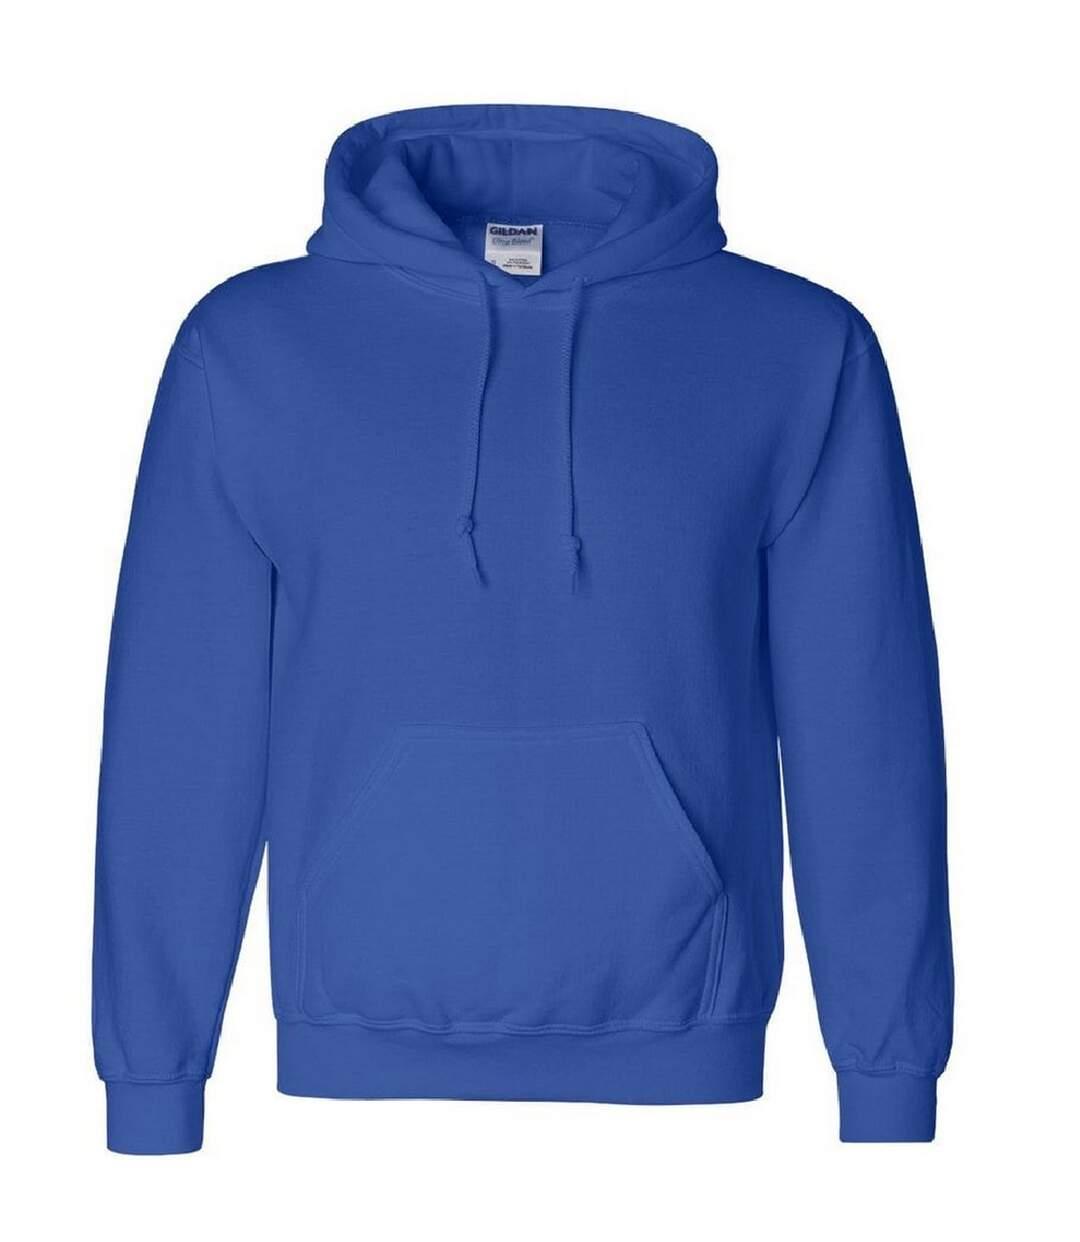 Gildan Heavyweight DryBlend Adult Unisex Hooded Sweatshirt Top / Hoodie (13 Colours) (Royal) - UTBC461